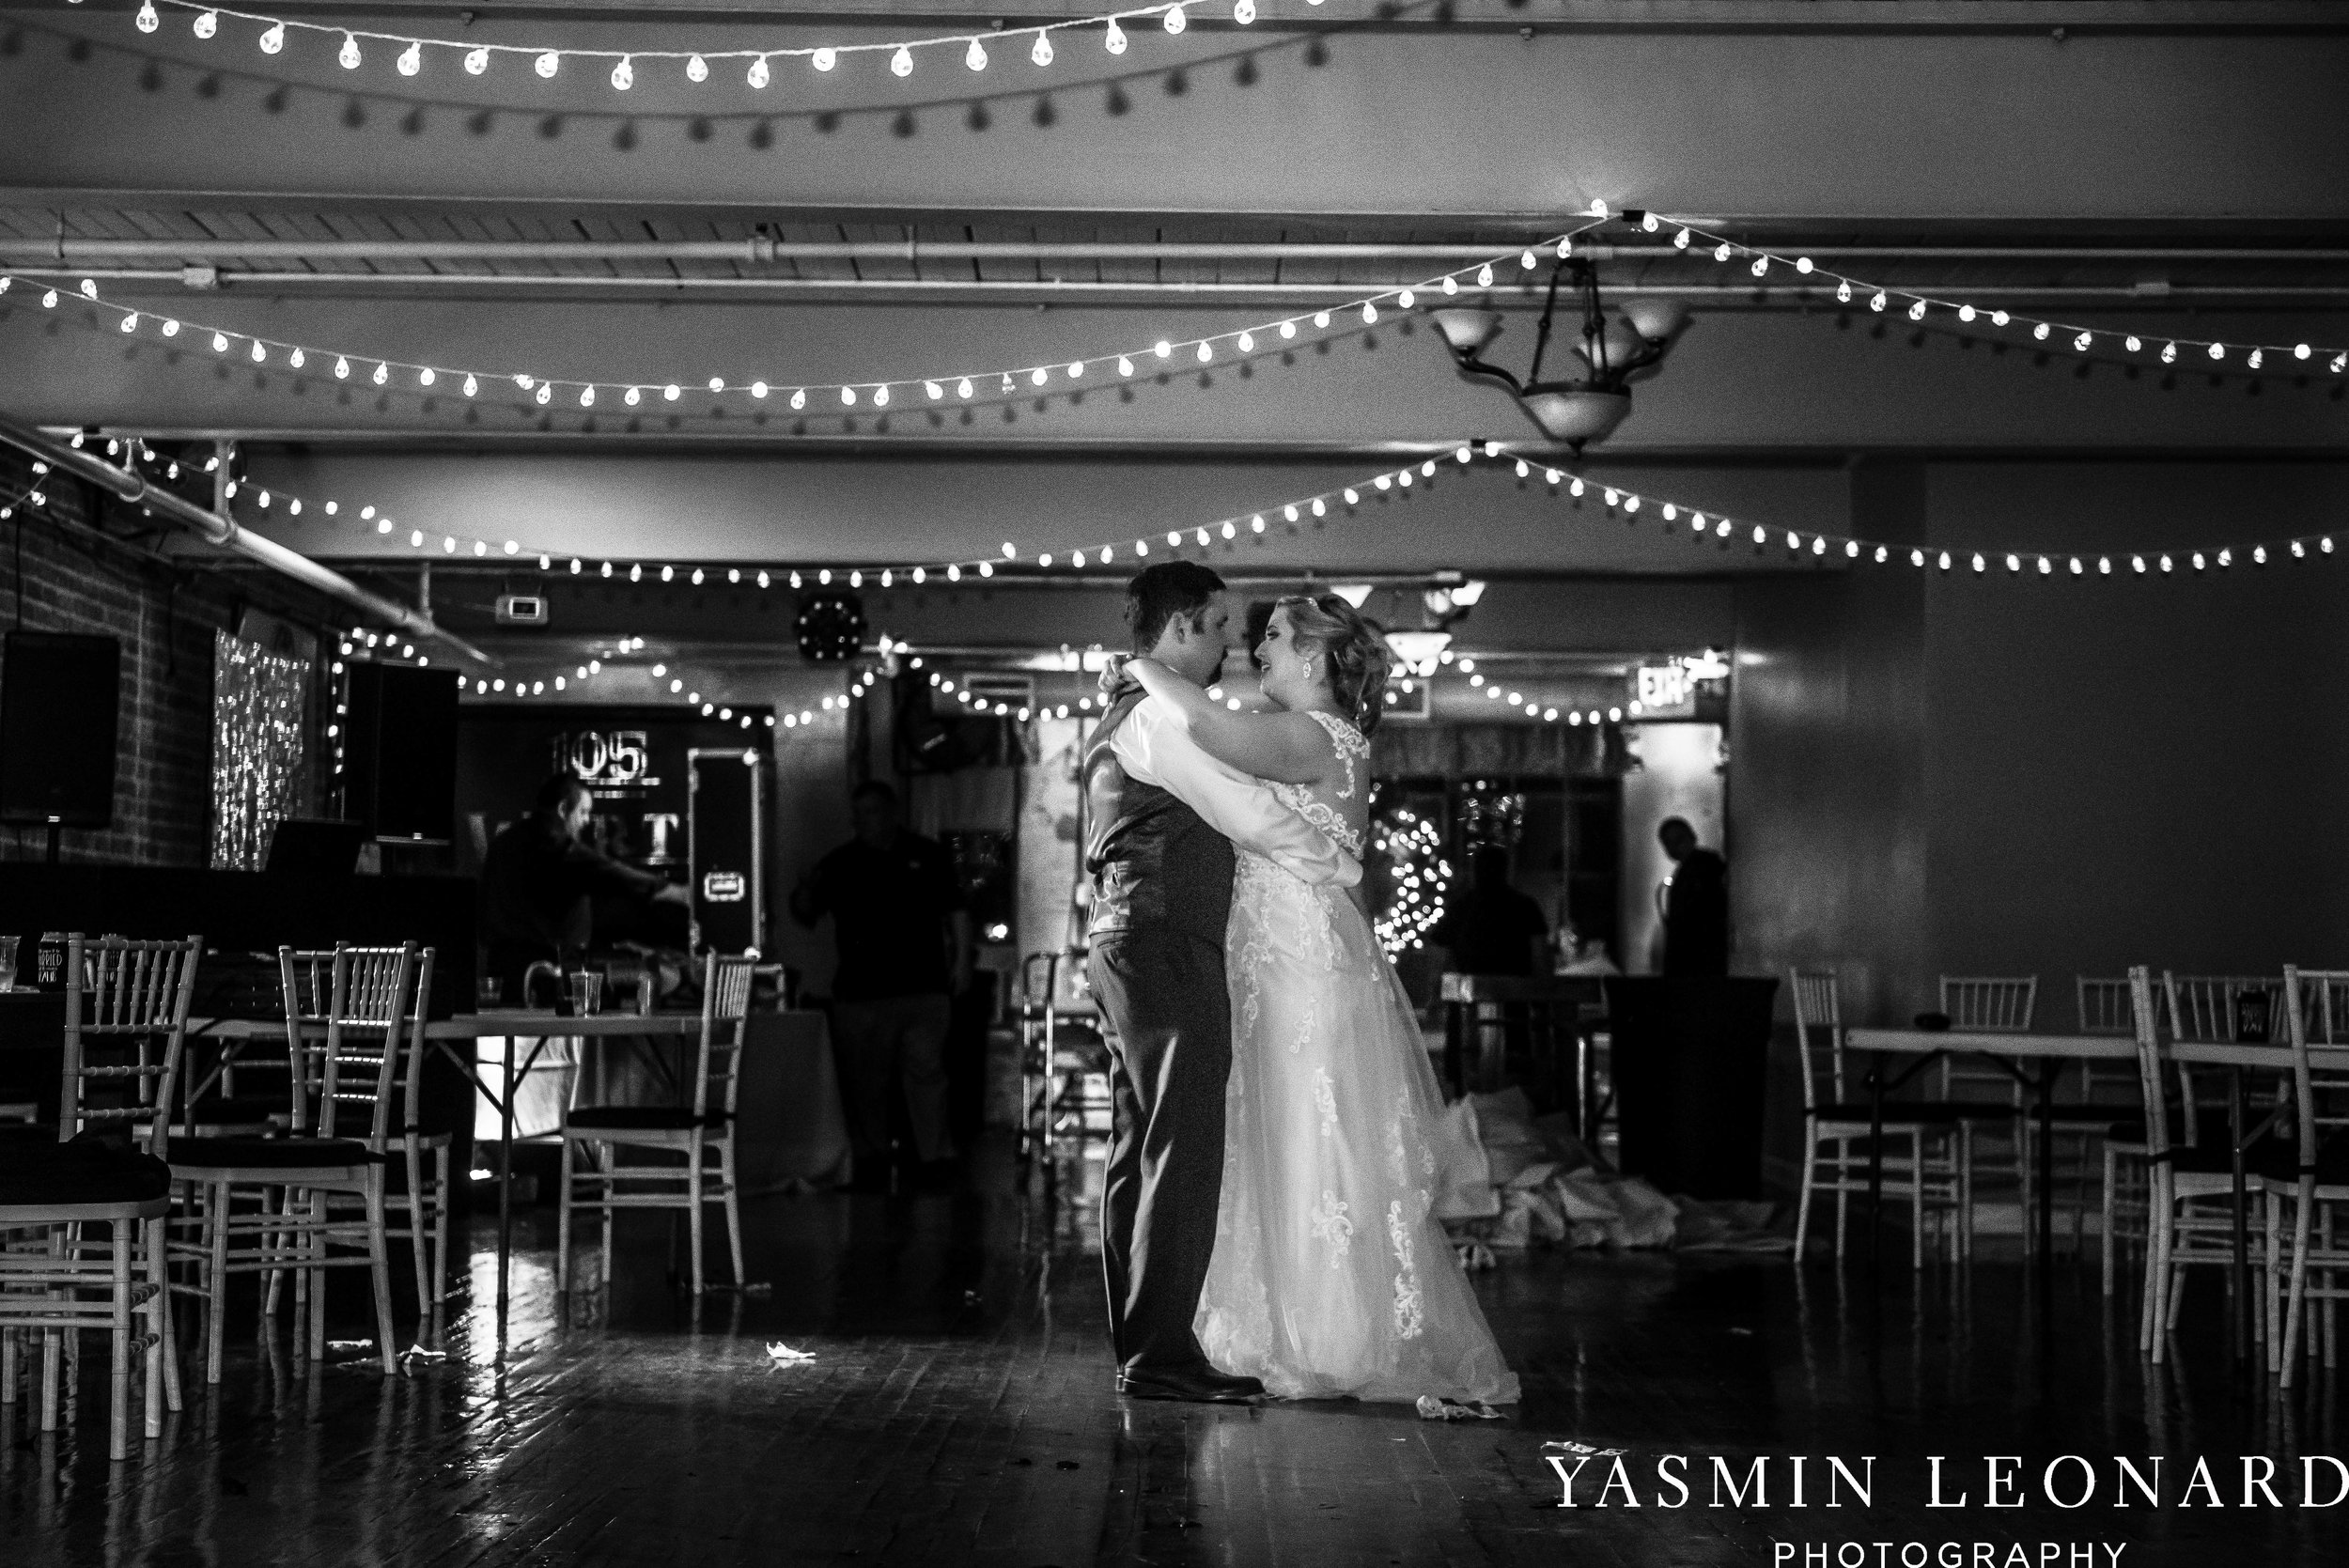 Rebekah and Matt - 105 Worth Event Centre - Yasmin Leonard Photography - Asheboro Wedding - NC Wedding - High Point Weddings - Triad Weddings - Winter Wedding-90.jpg